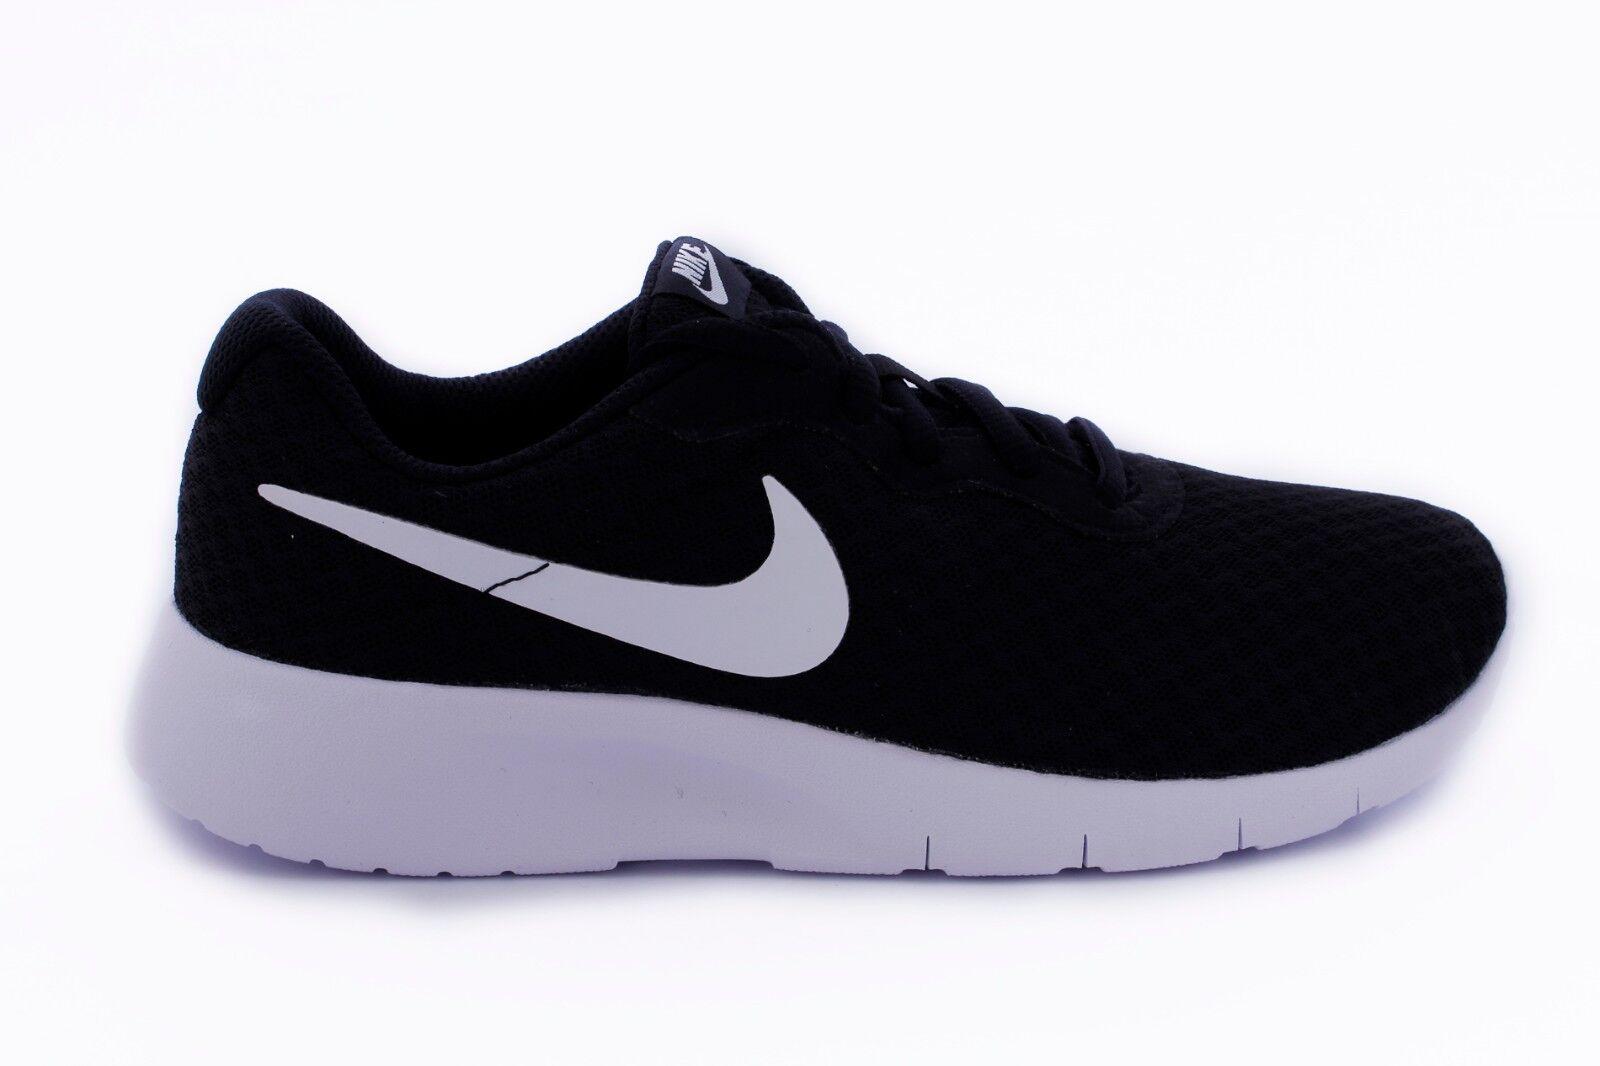 Scarpa Nike nera donna Tanjun Tanjun Tanjun GS 818381011 | Outlet Store Online  | Gentiluomo/Signora Scarpa  6bba7e